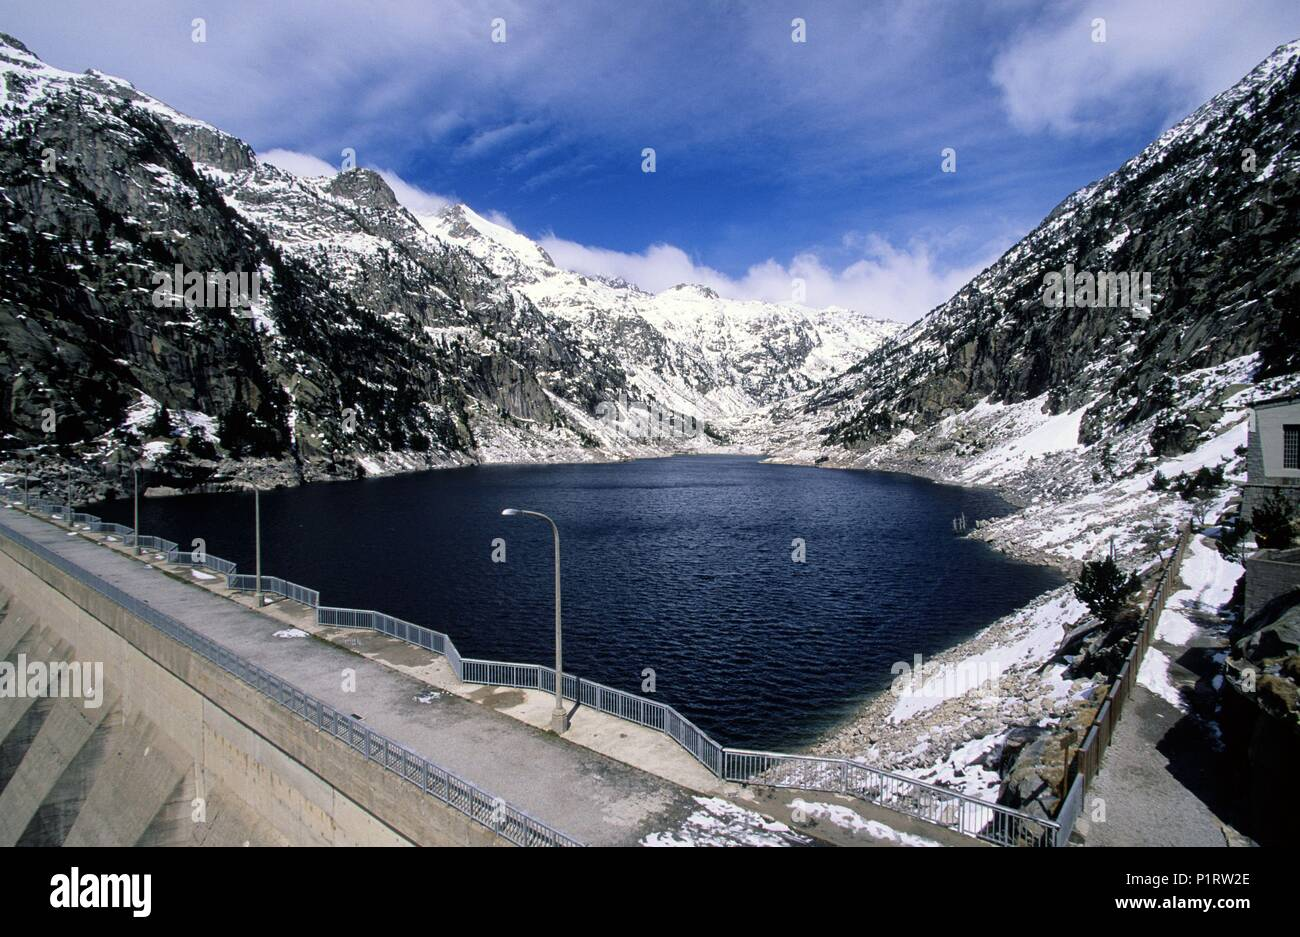 Alta Ribagorça: 'Cavallers' dam (Alta Ribagorça/ Ribagorza region). - Stock Image